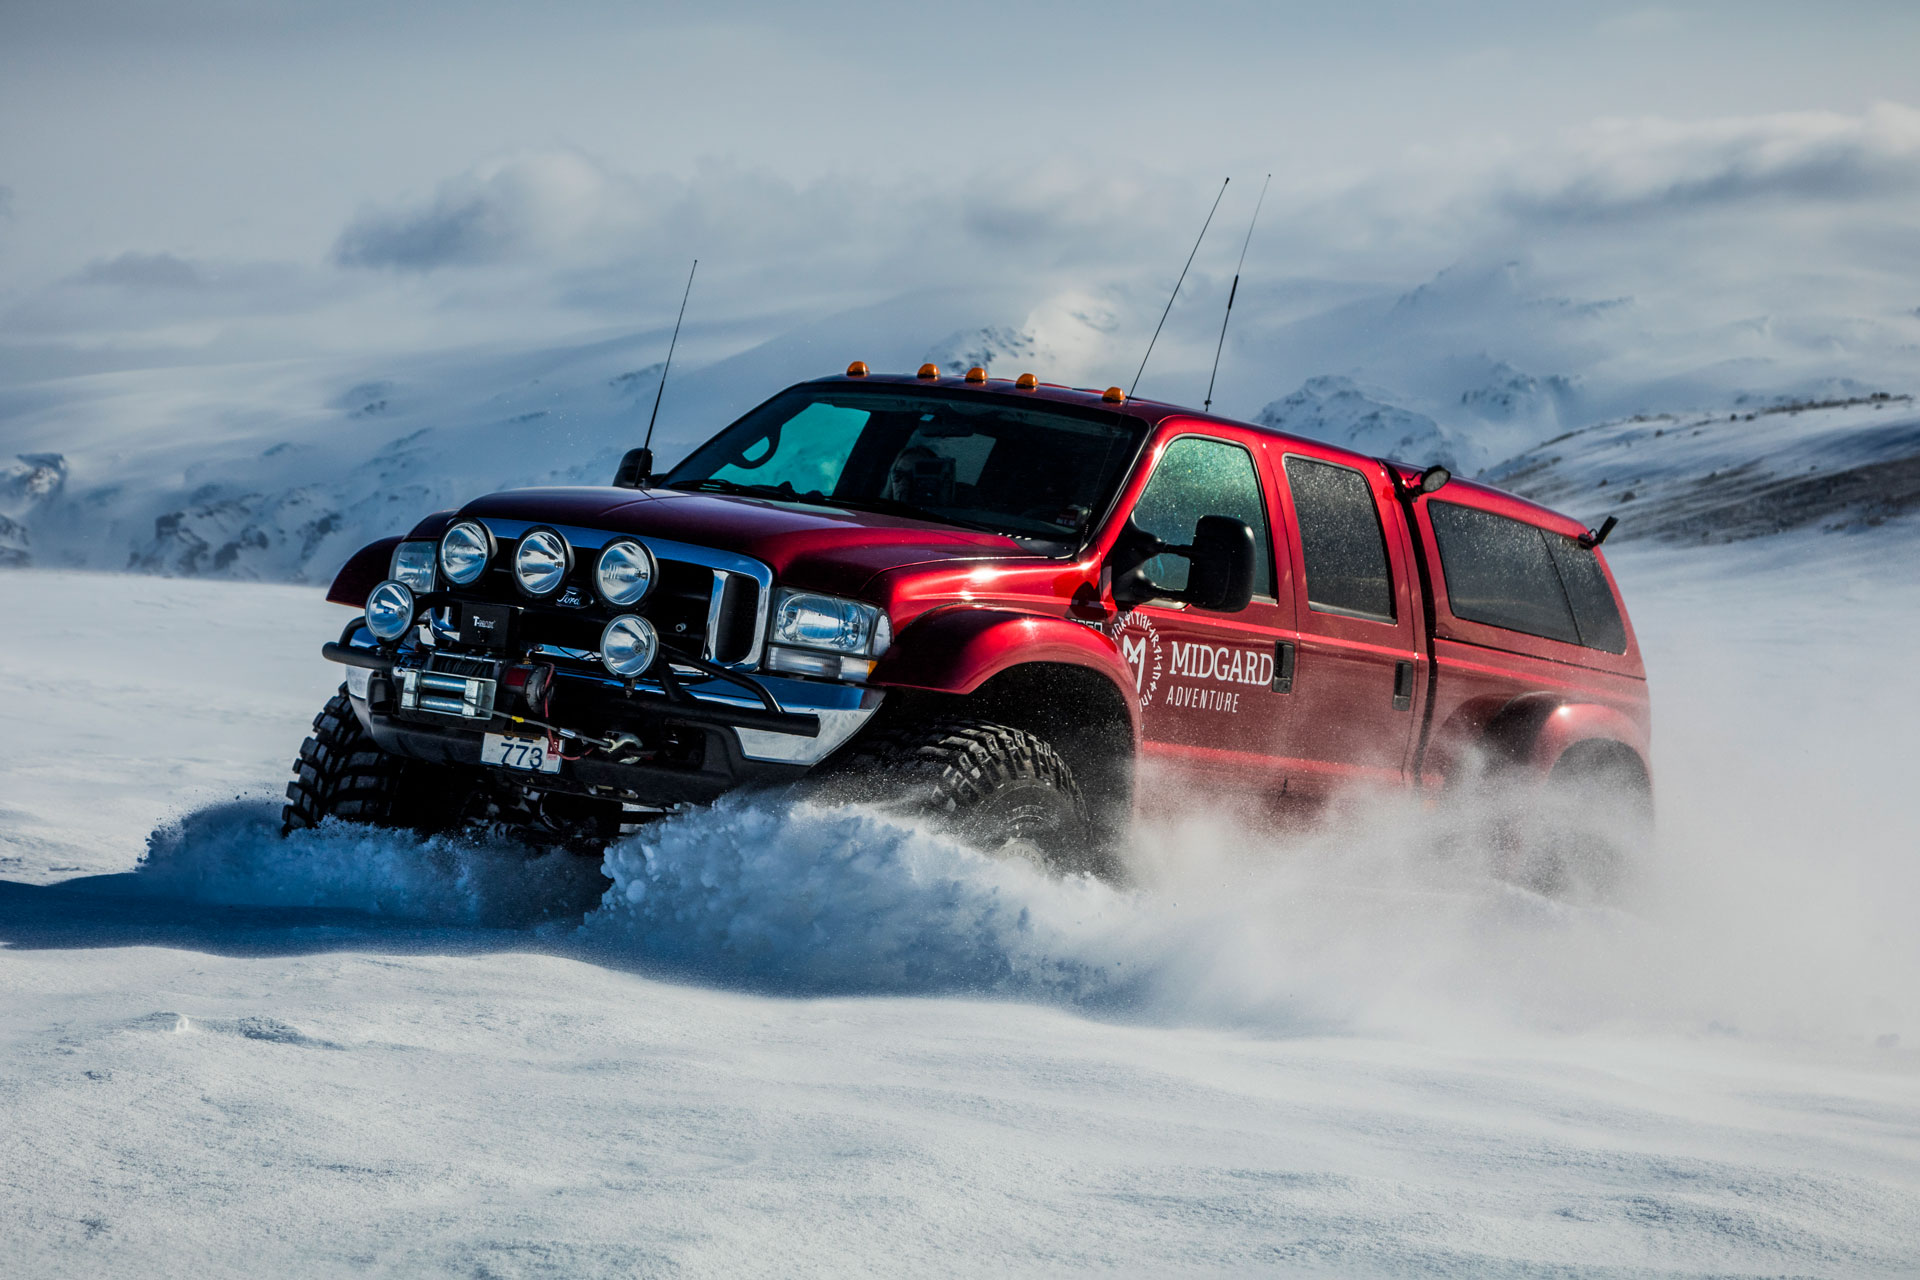 Super Jeeps are the only vehicle capable of traversing Þórsmörk Valley.